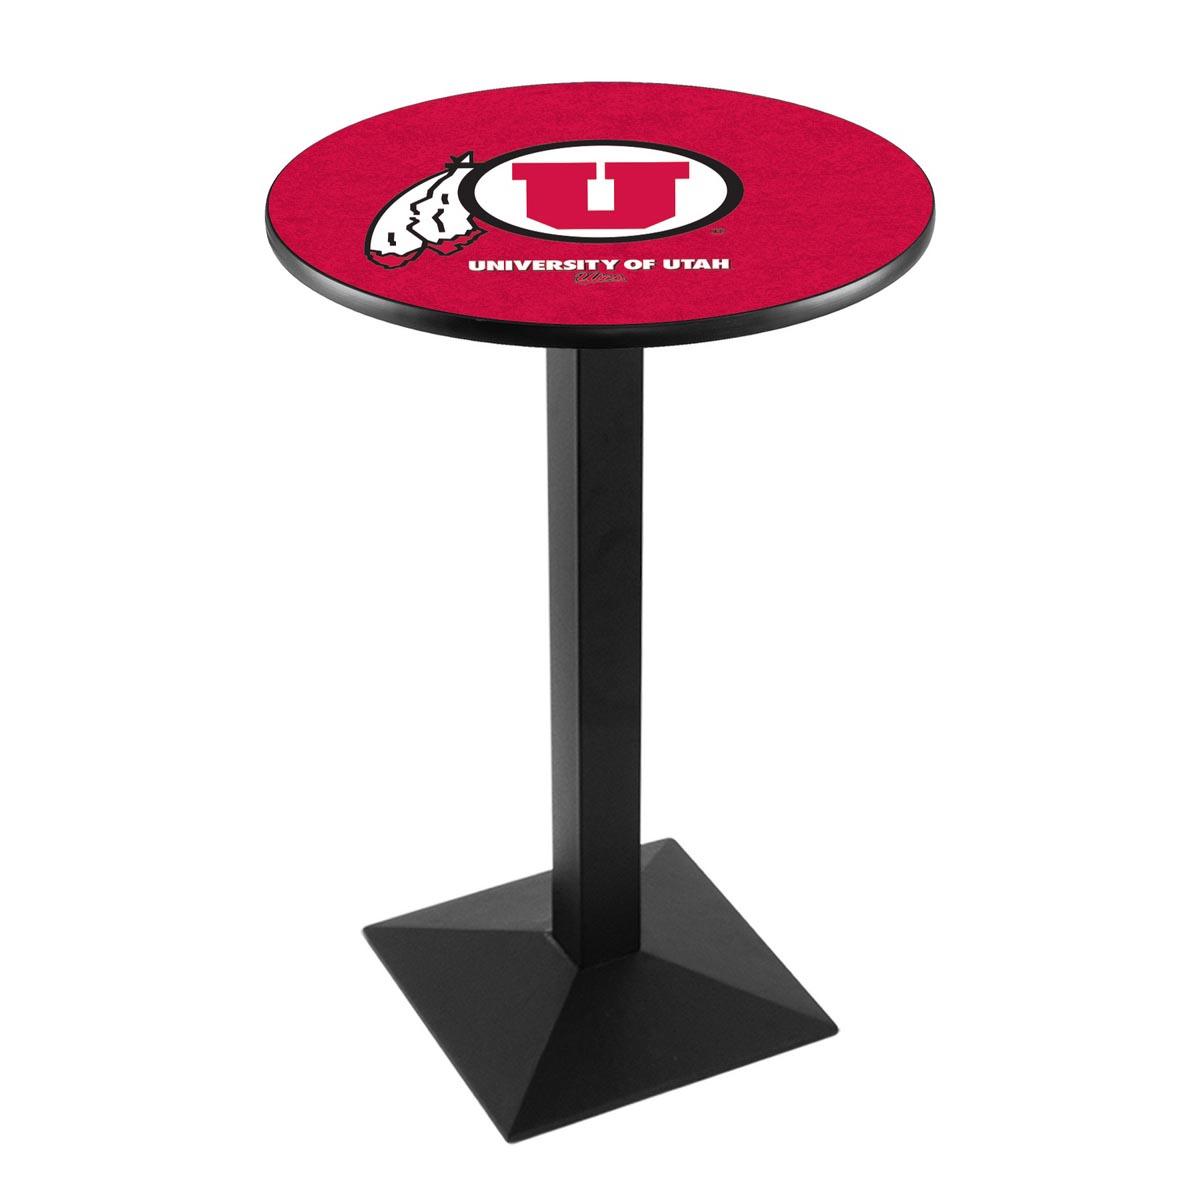 Remarkable University Utah Logo Pub Bar Table Square Stand Product Photo